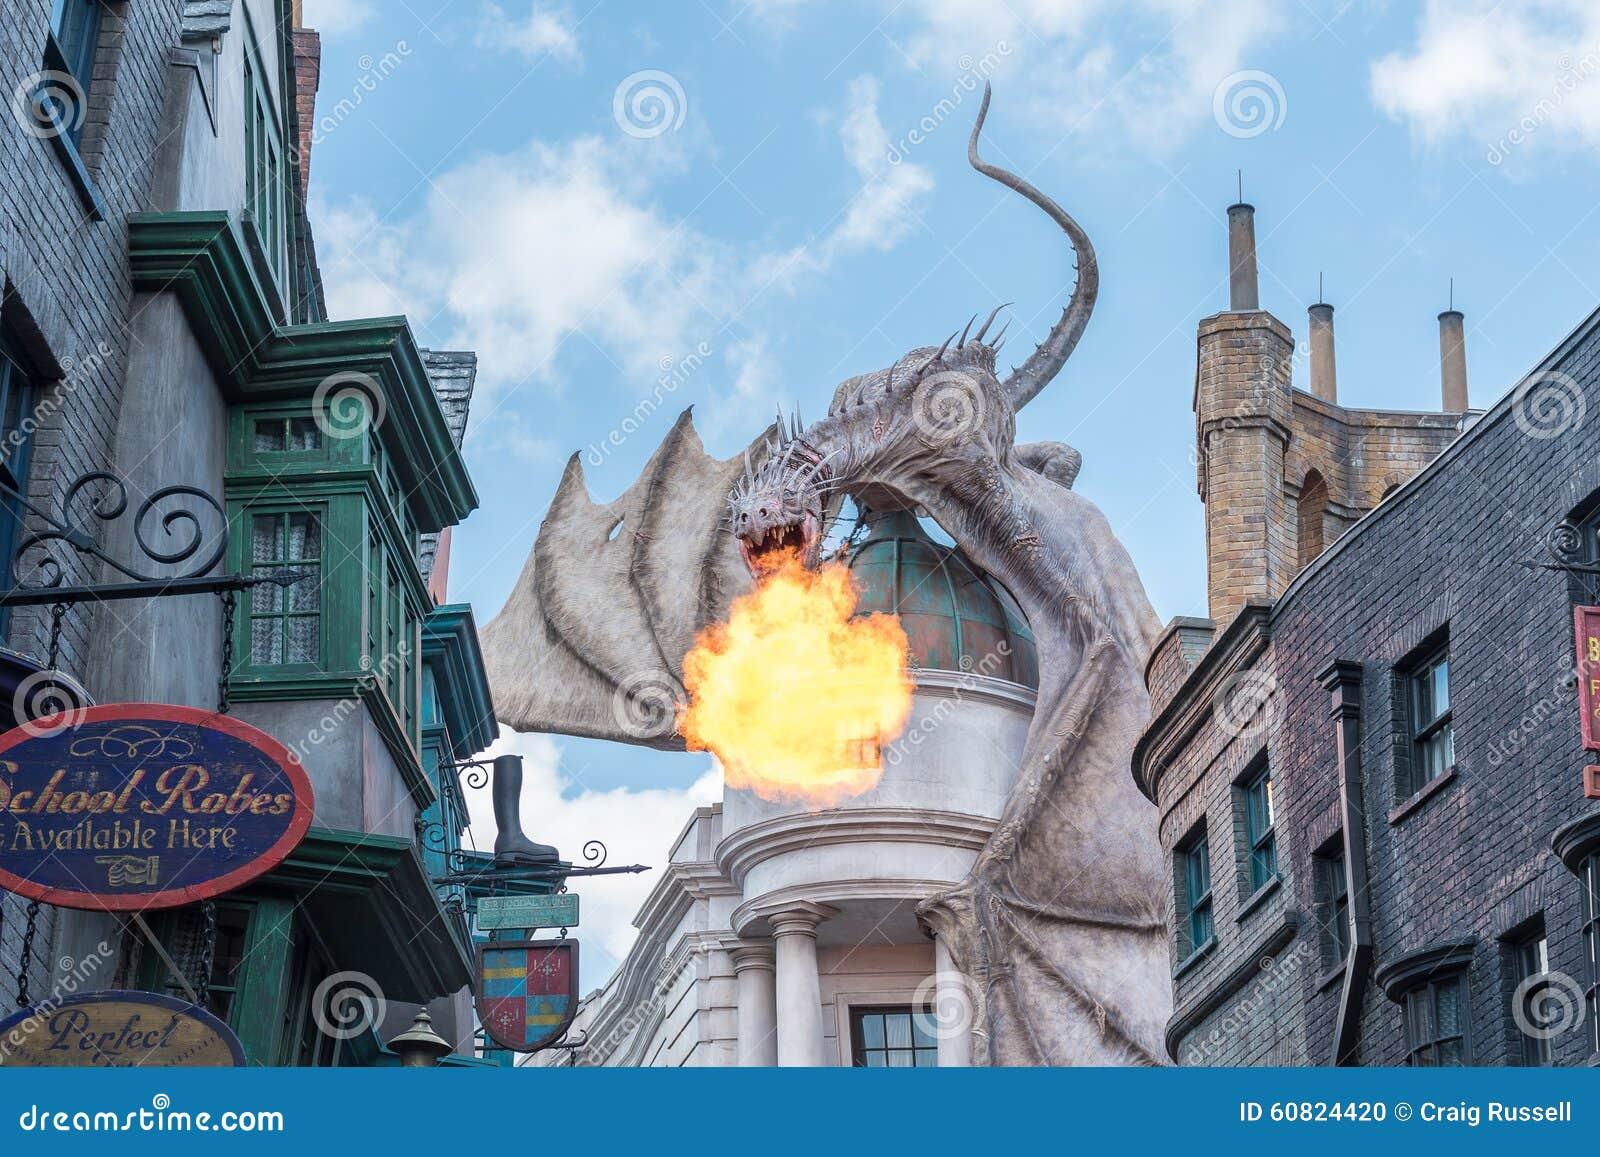 , USA - SEPTEMBER 02, 2015: Dragon on top of Gringotts bank breathing ...